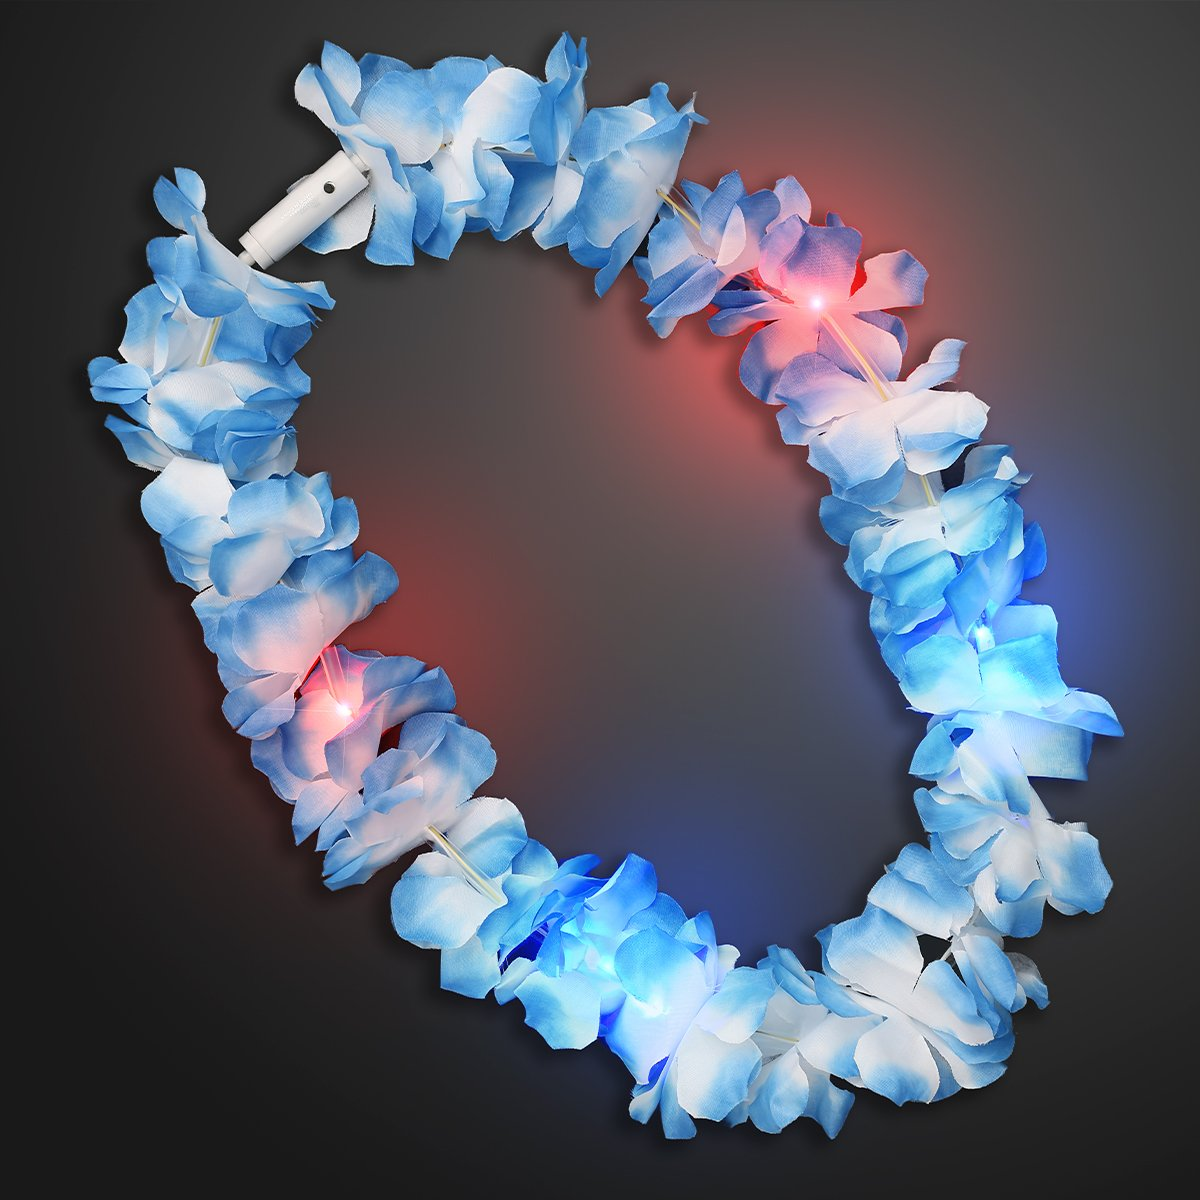 Large Assorted Light Up Hawaiian Leis with Flashing LED Lights (Set of 24) by FlashingBlinkyLights (Image #2)